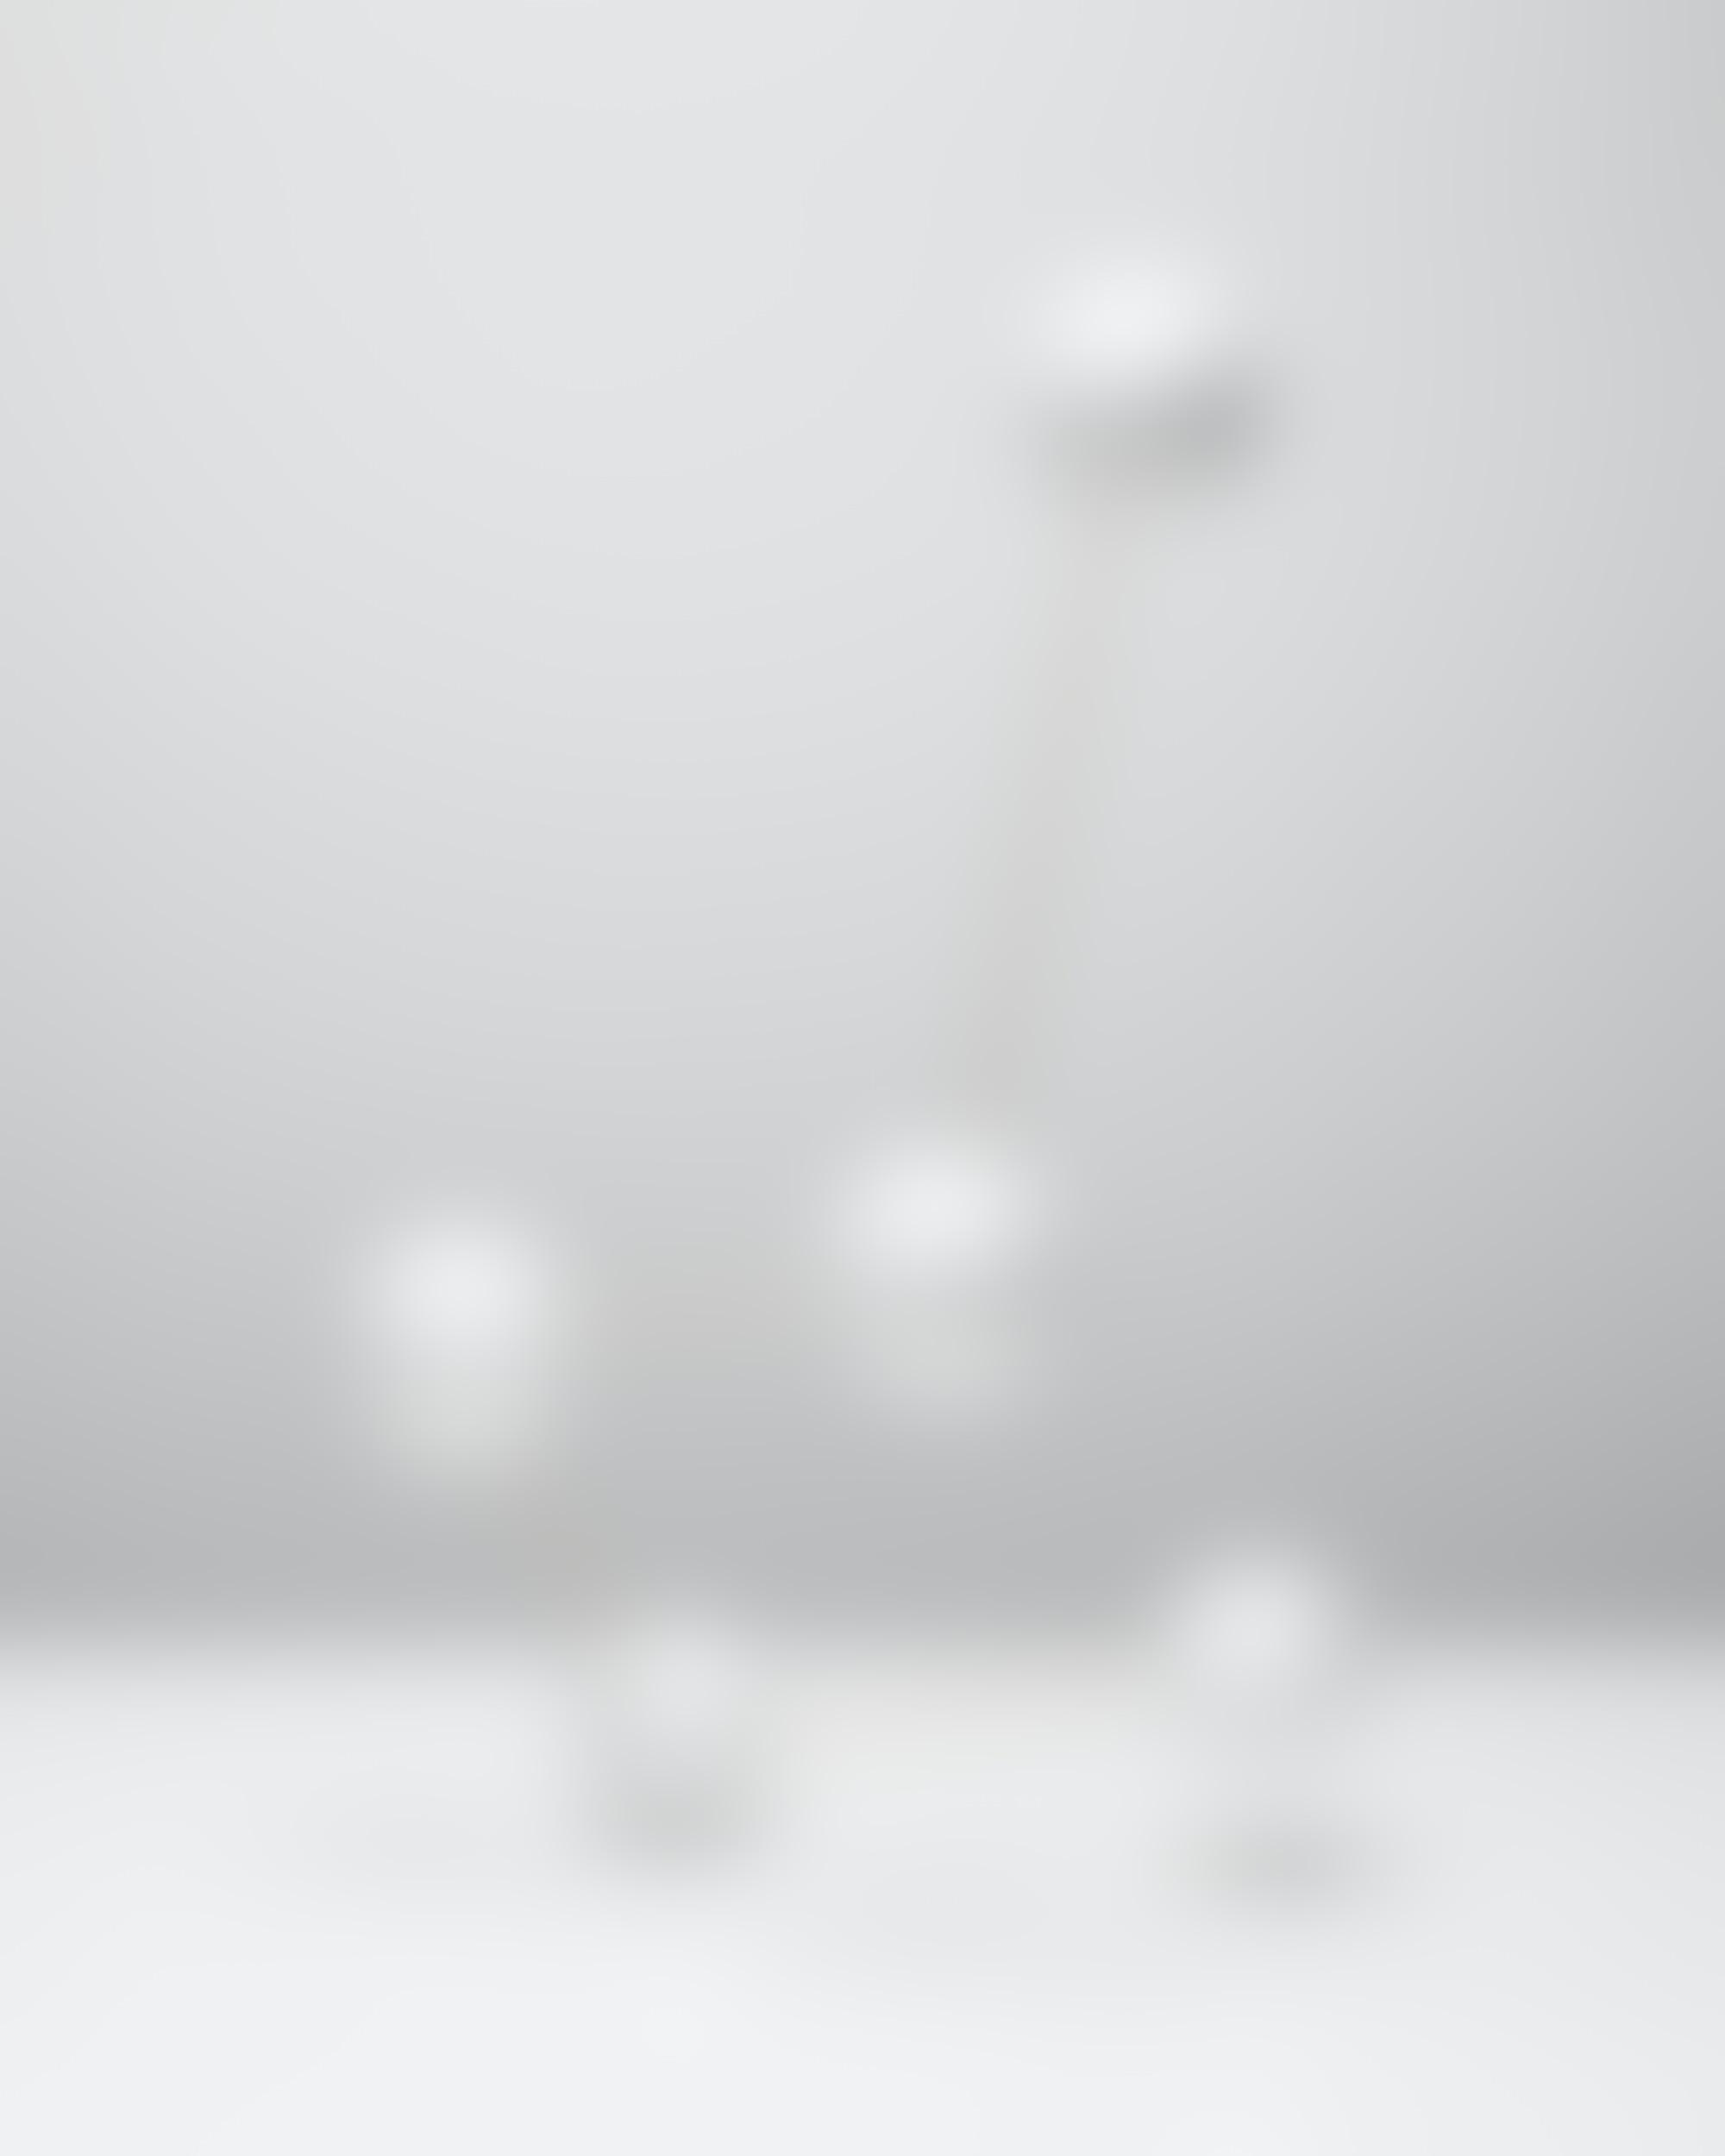 DNA1 autocompressfitresizeixlibphp 1 1 0max h2000max w3 D2000q80s09545fc5058c349d9d2862c0b010546b